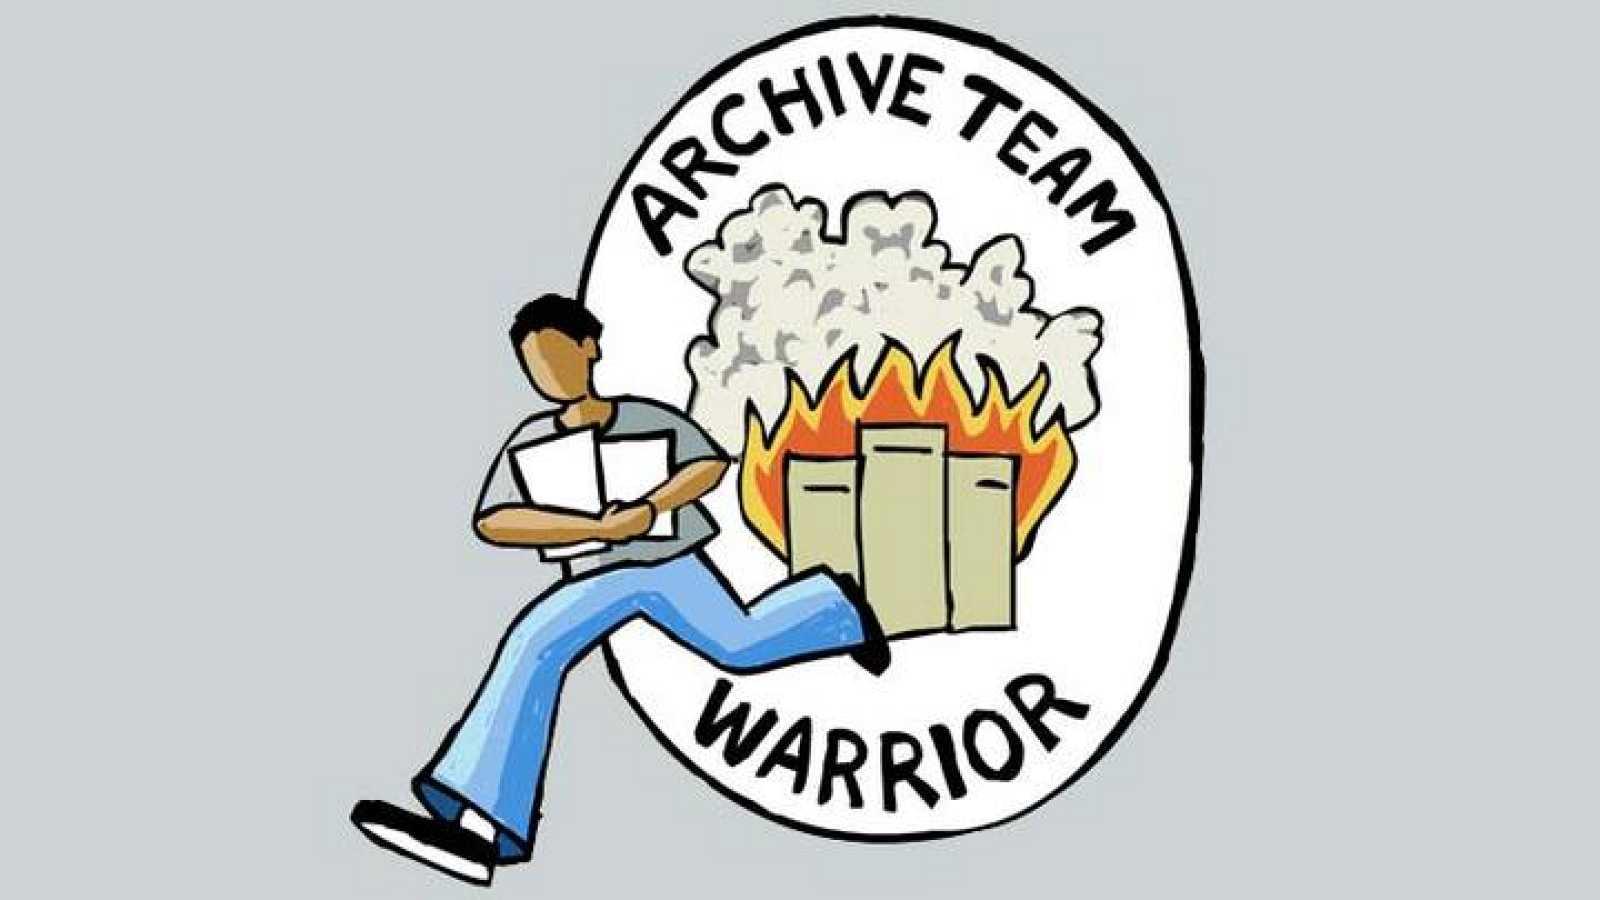 Archive team